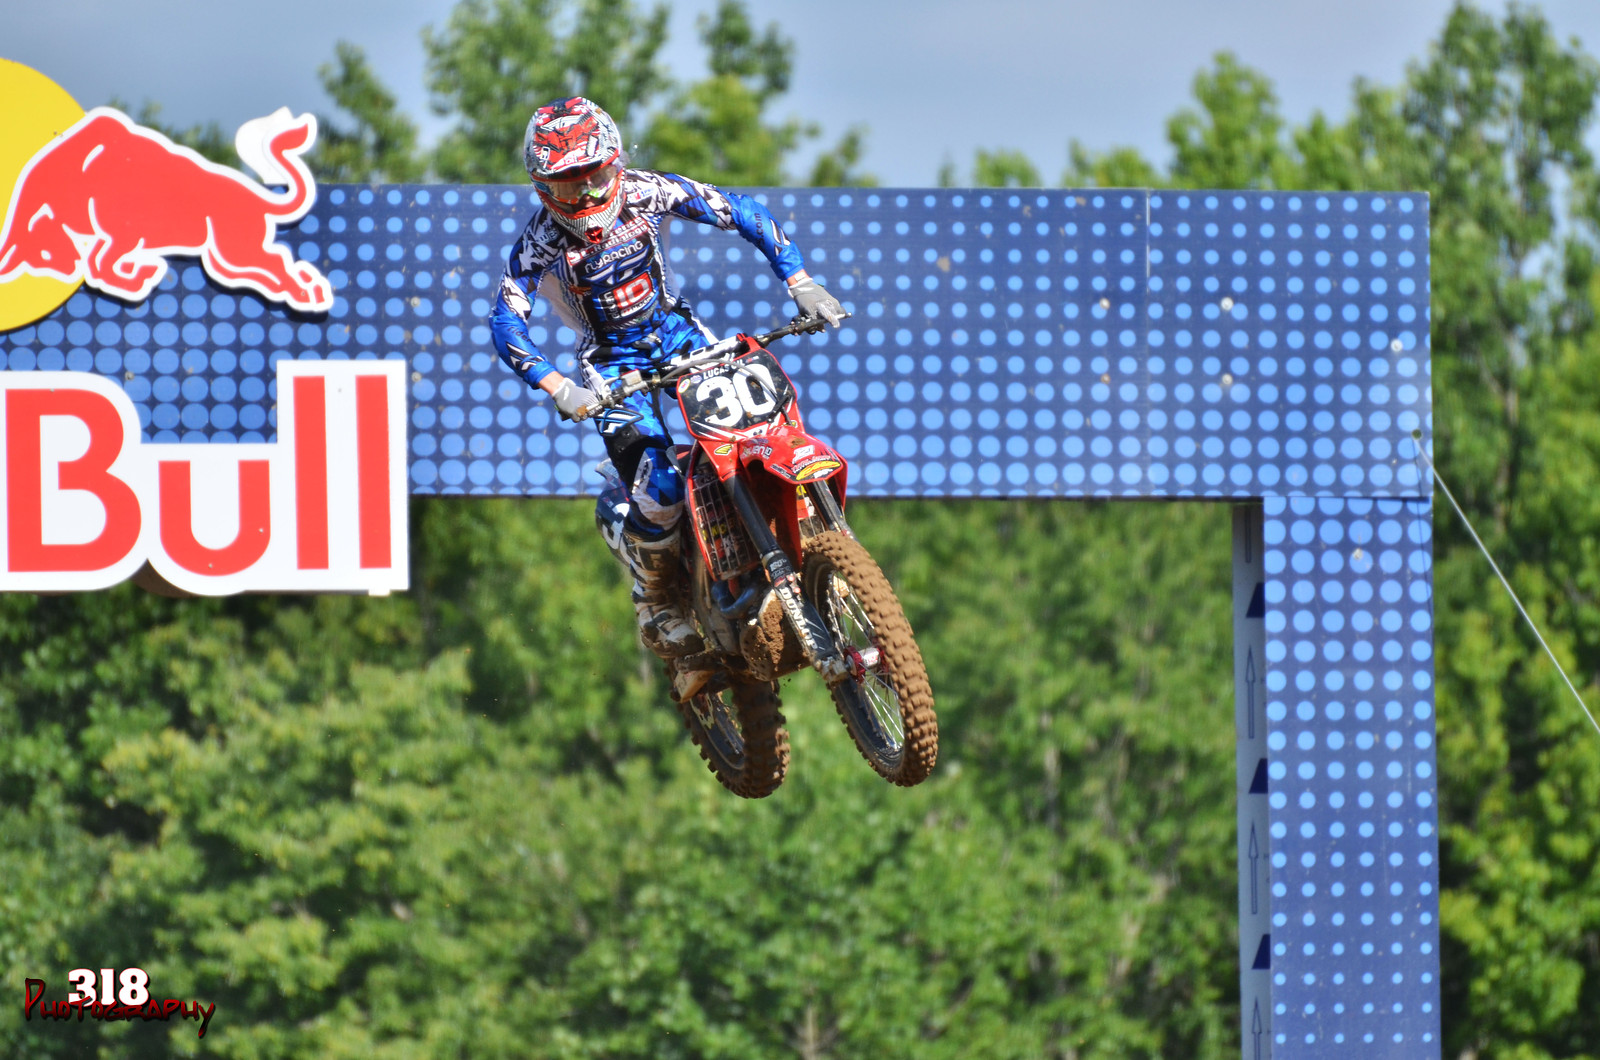 30-02 - MxPro318 - Motocross Pictures - Vital MX